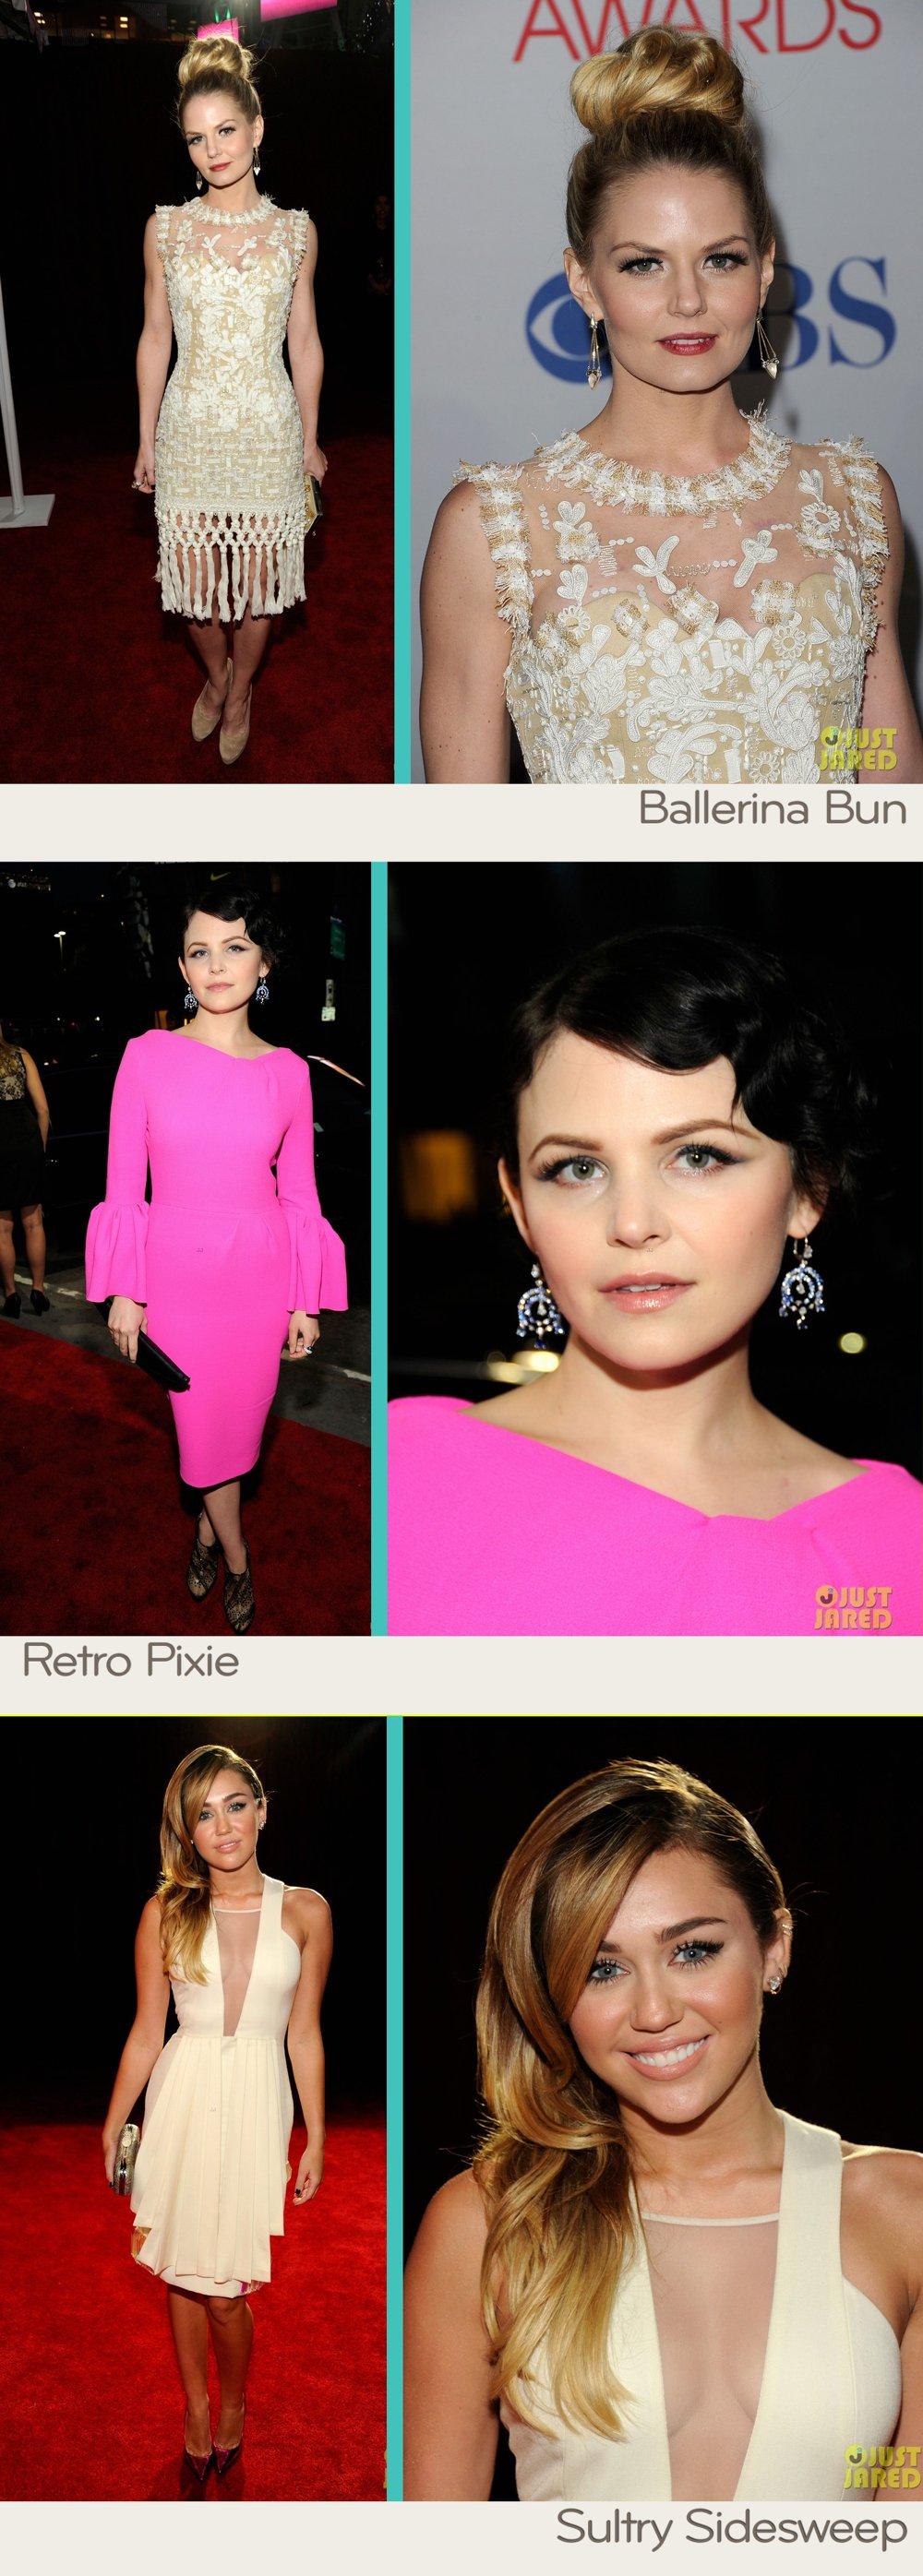 Wedding-hair-makeup-inspiration-red-carpet-2012-miley-cyrus.full